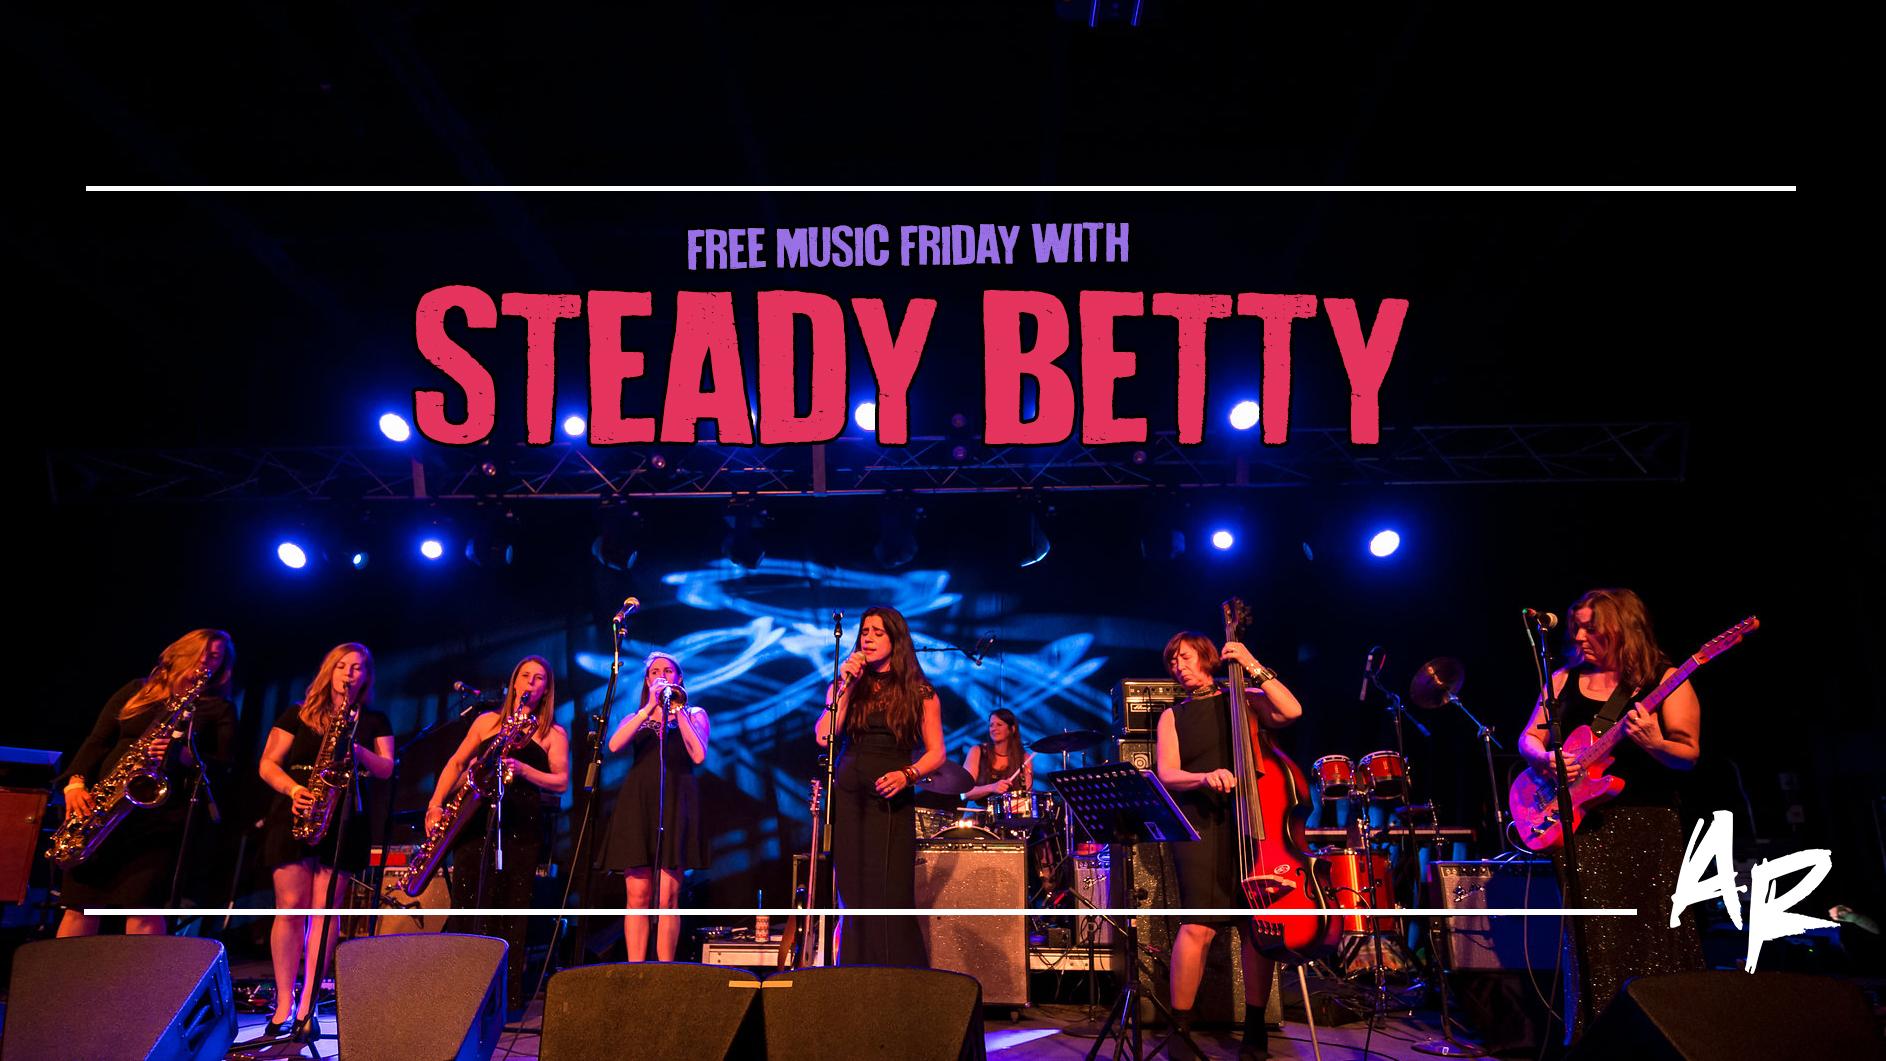 steadybetty_artsriot